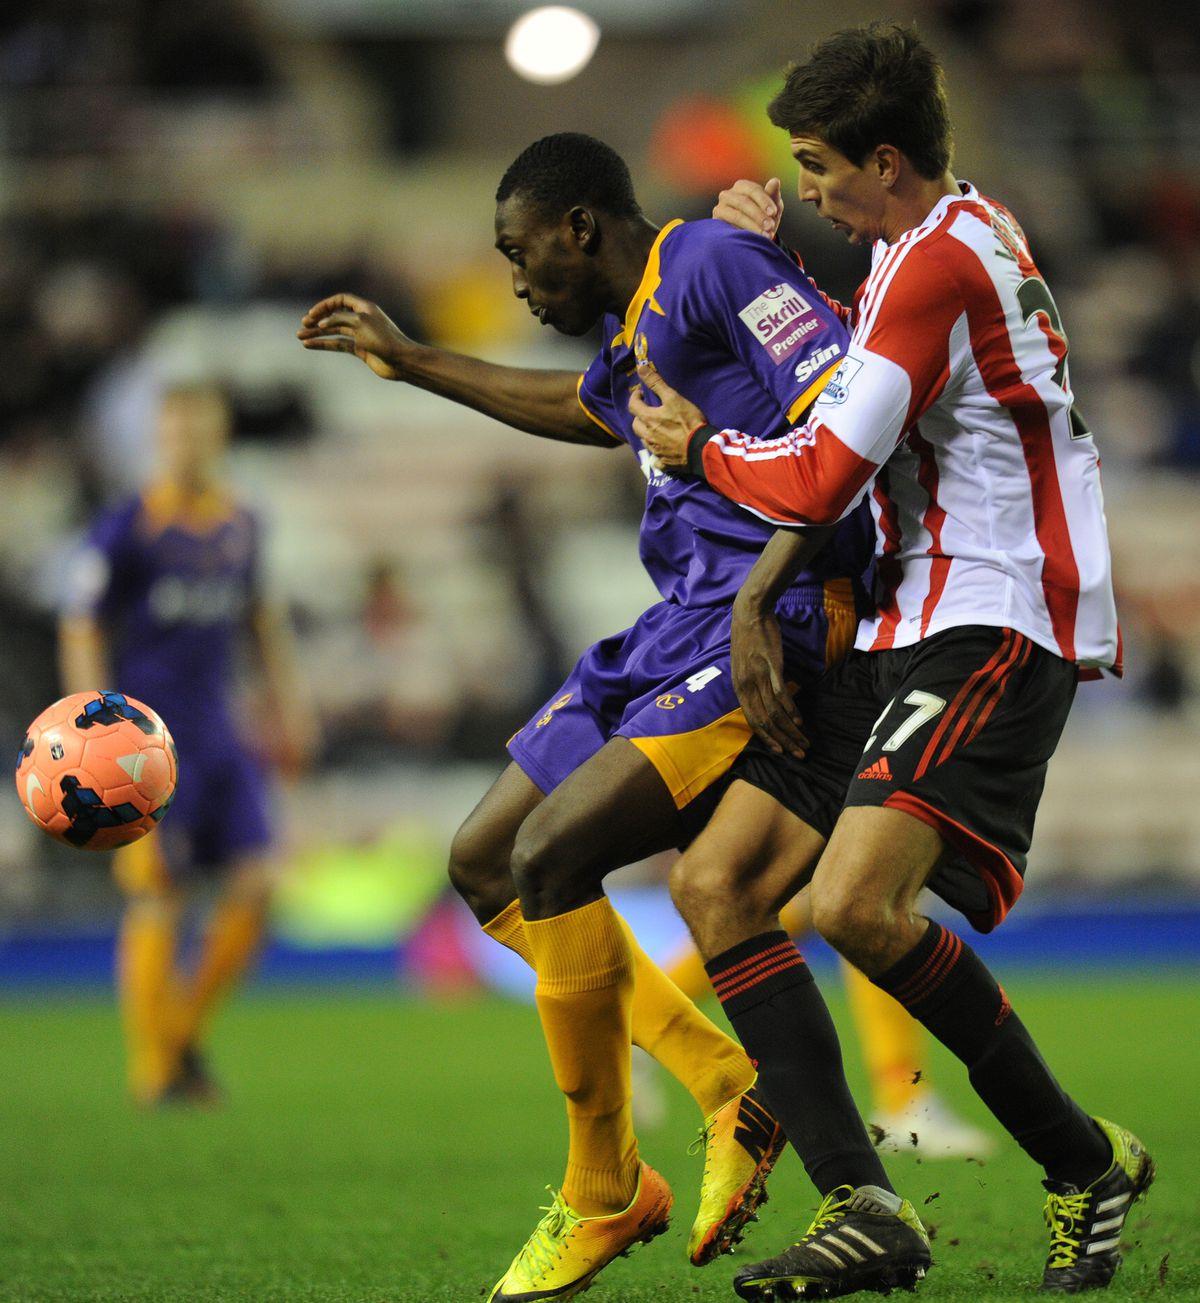 Soccer - FA Cup - Fourth Round - Sunderland v Kidderminster Harriers - Stadium of Light